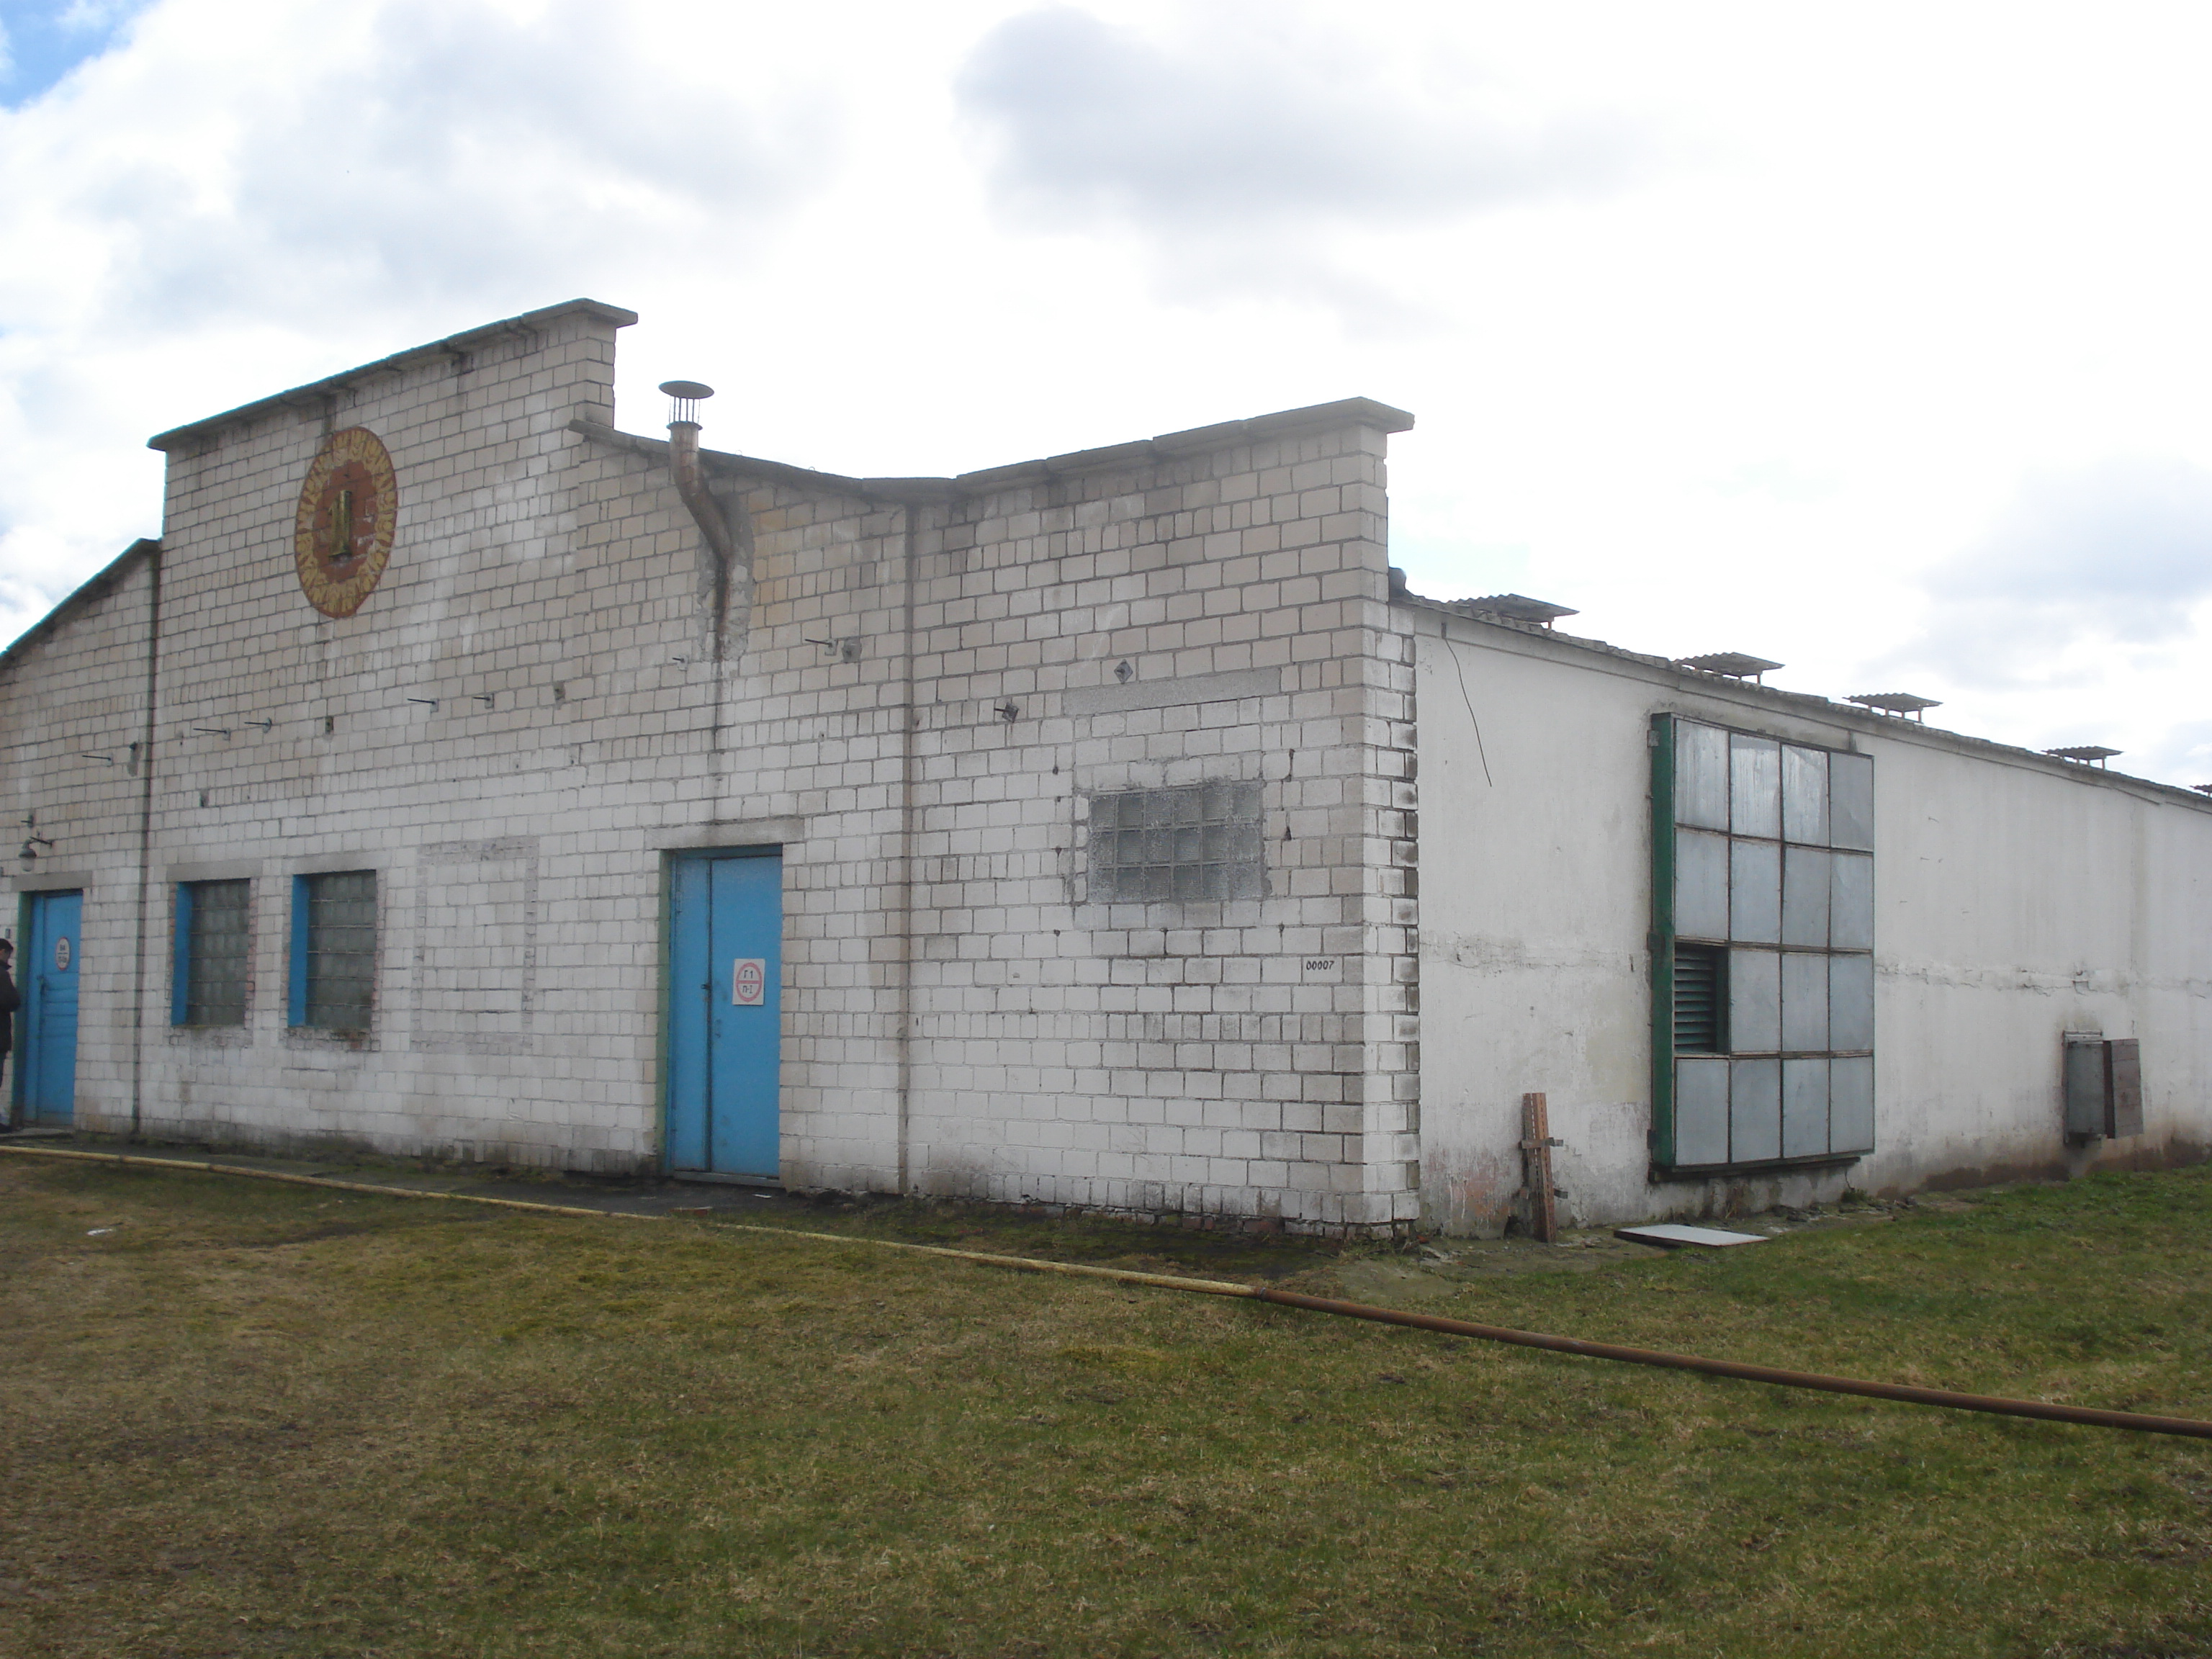 Беларуснефть-Особино -  заказчик Неофорс. Реконструкция птицефабрики